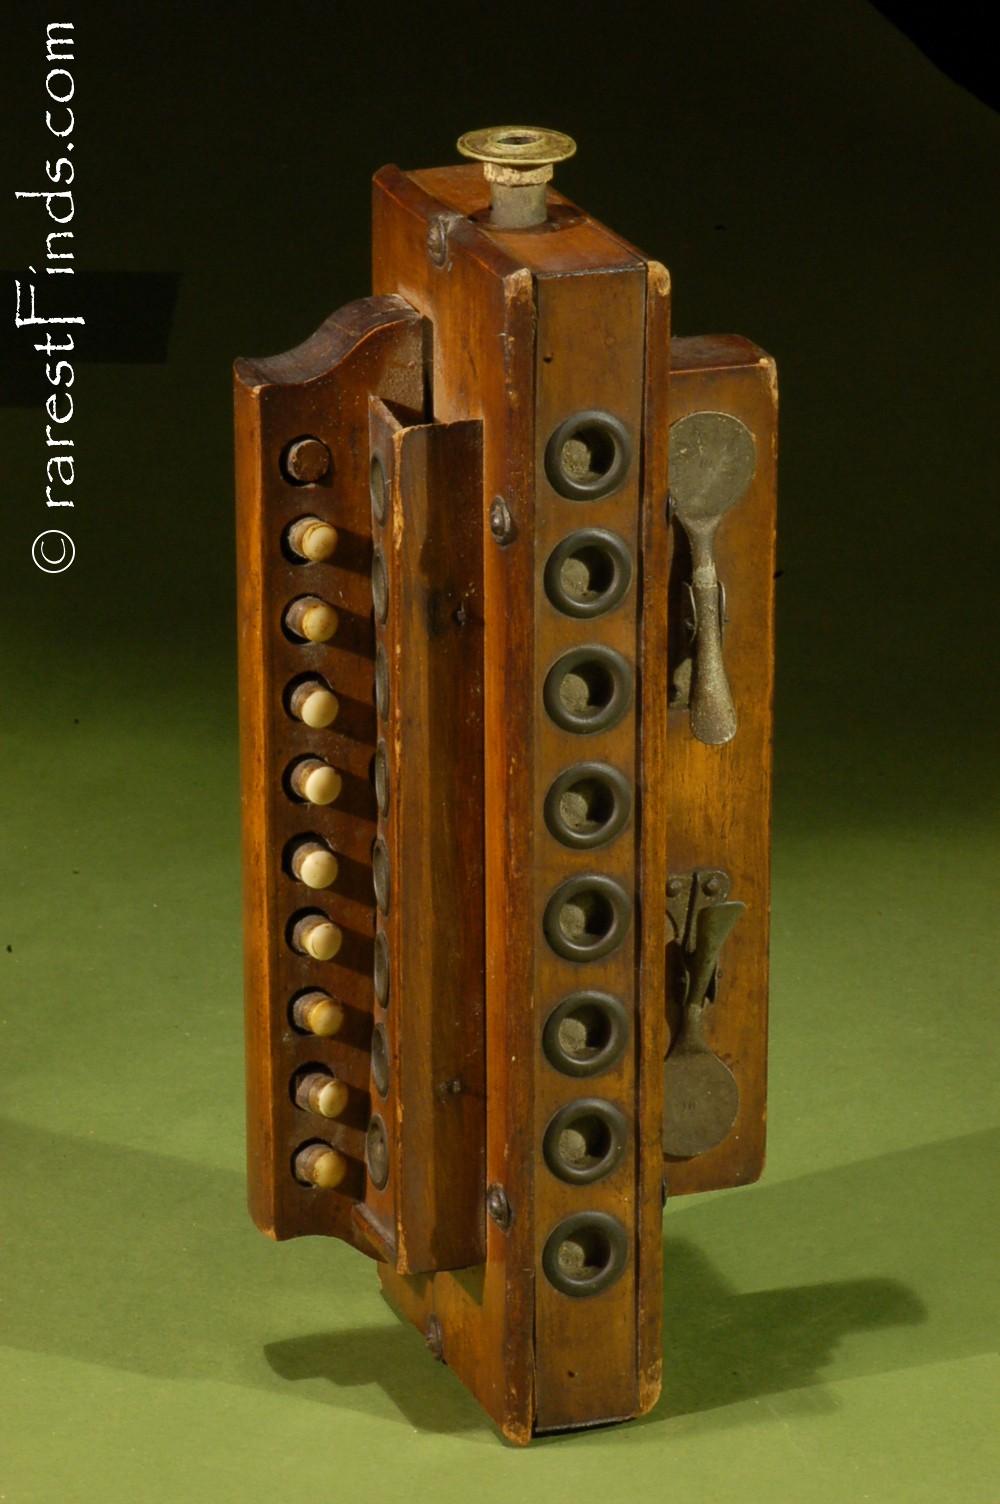 Earliest-Blow-Accordion-with-10-keys